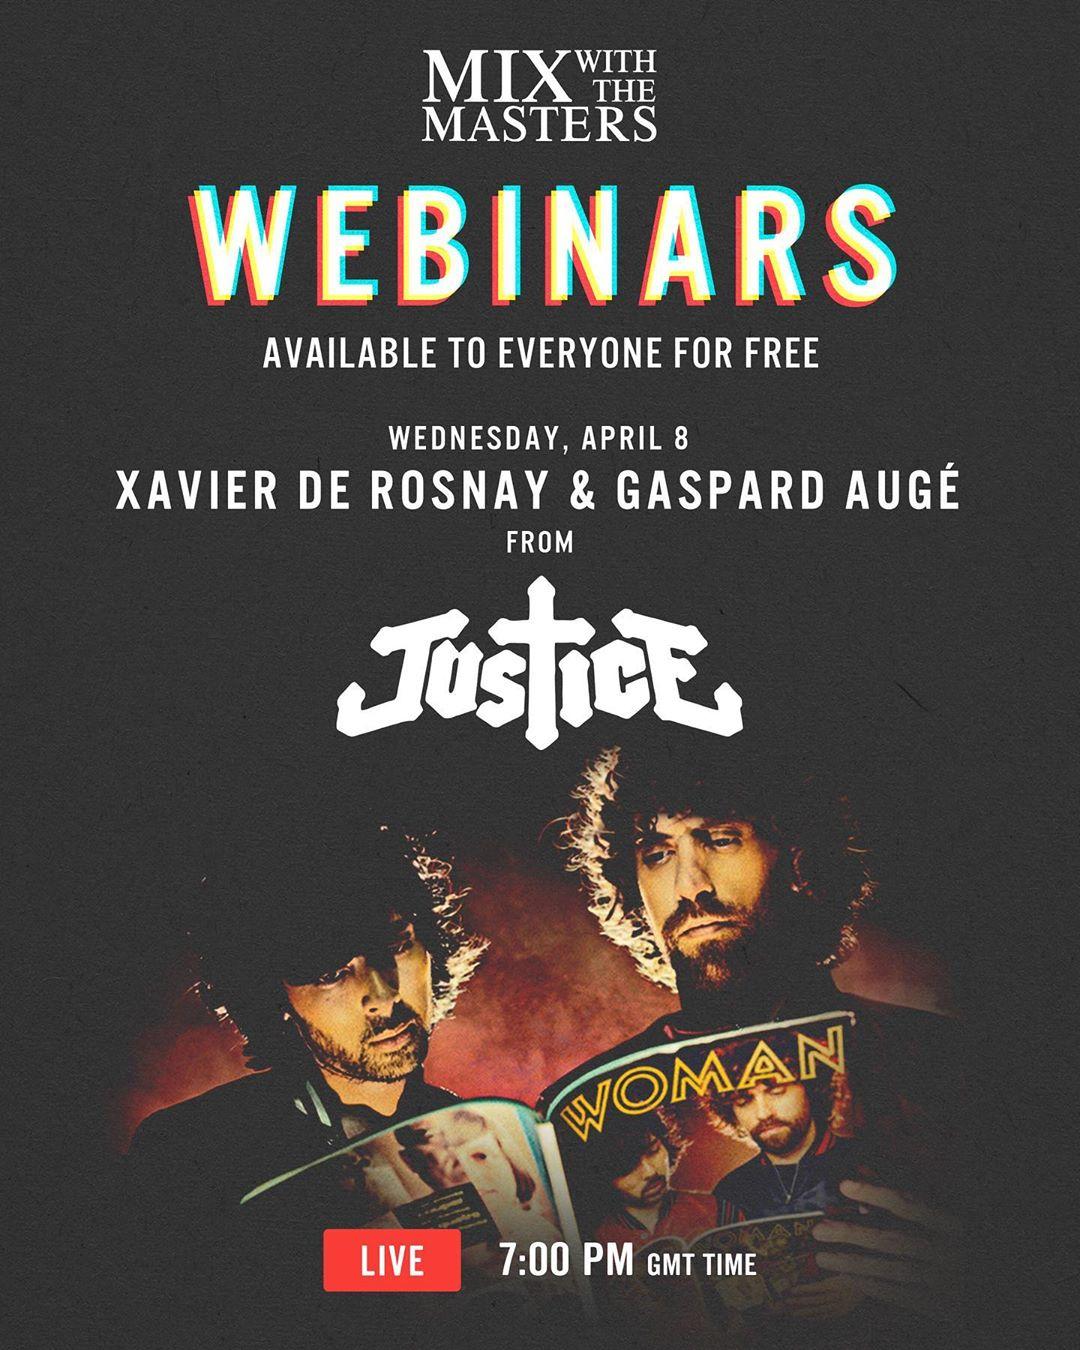 Webinar de Justice (fr) gratis el miércoles 8 a las 21hs